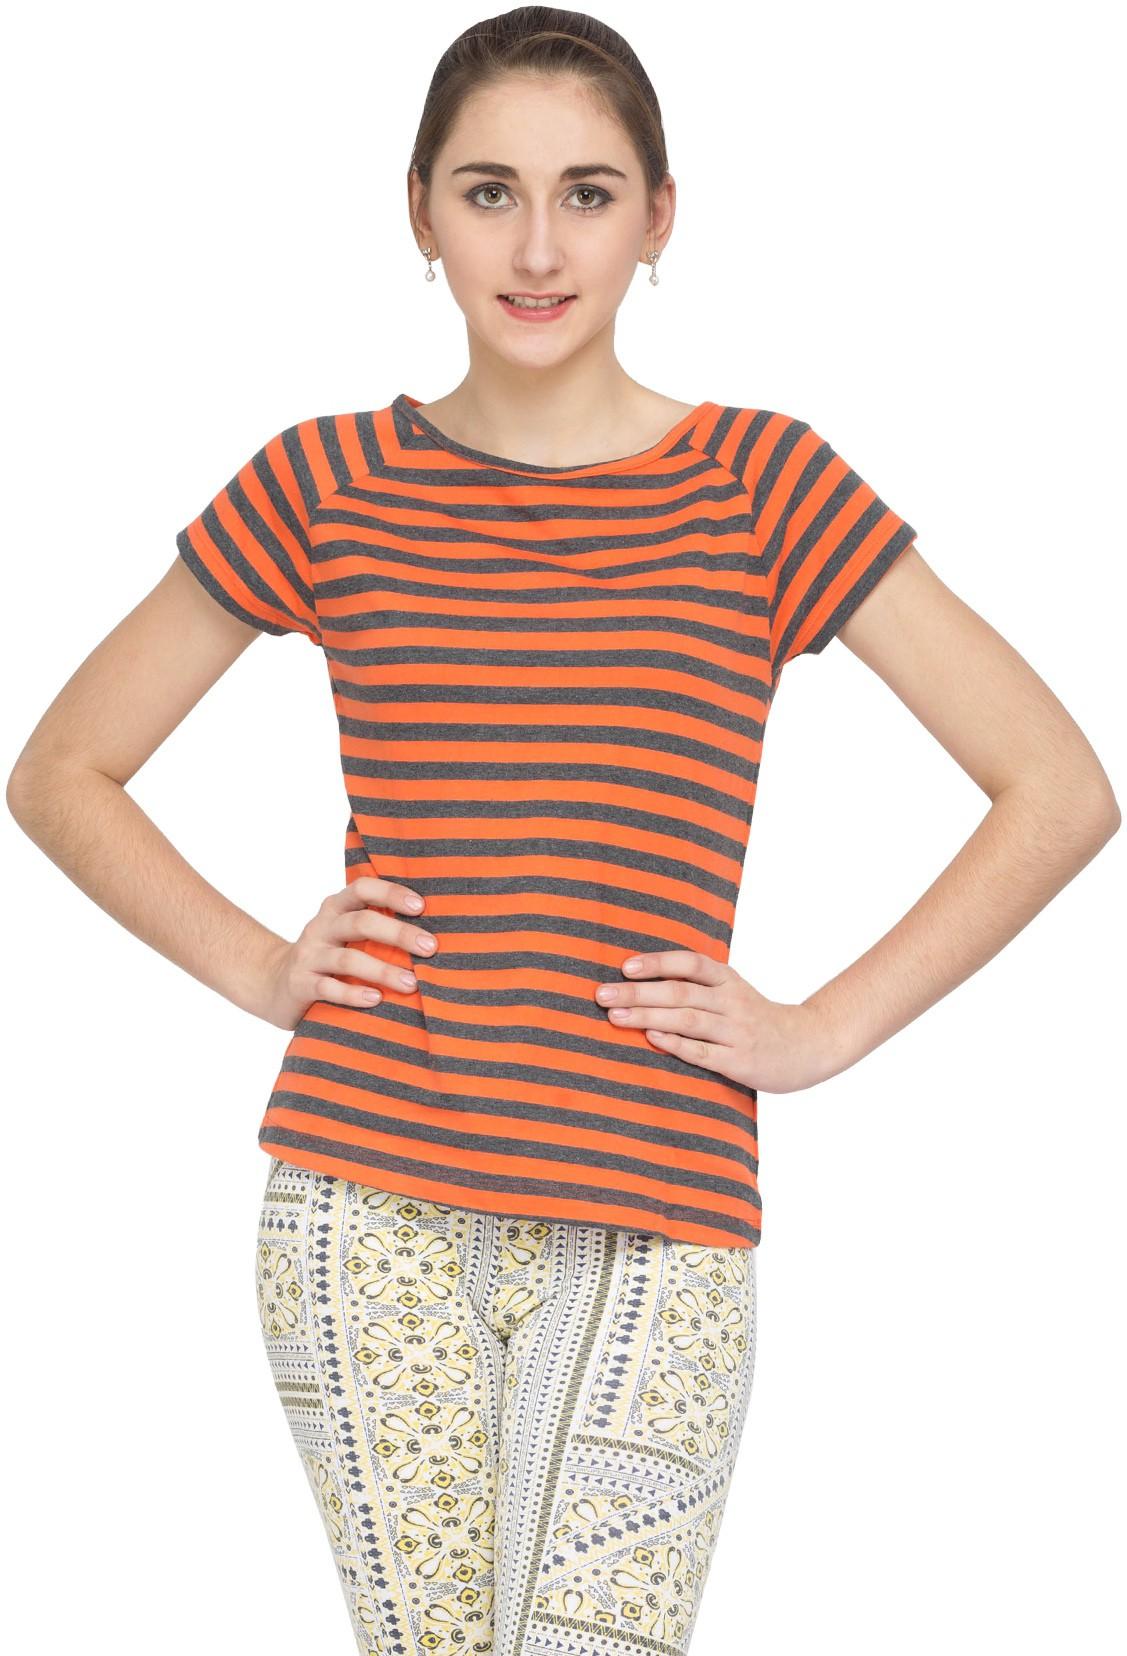 Alibi Striped Womens Round Neck T-Shirt